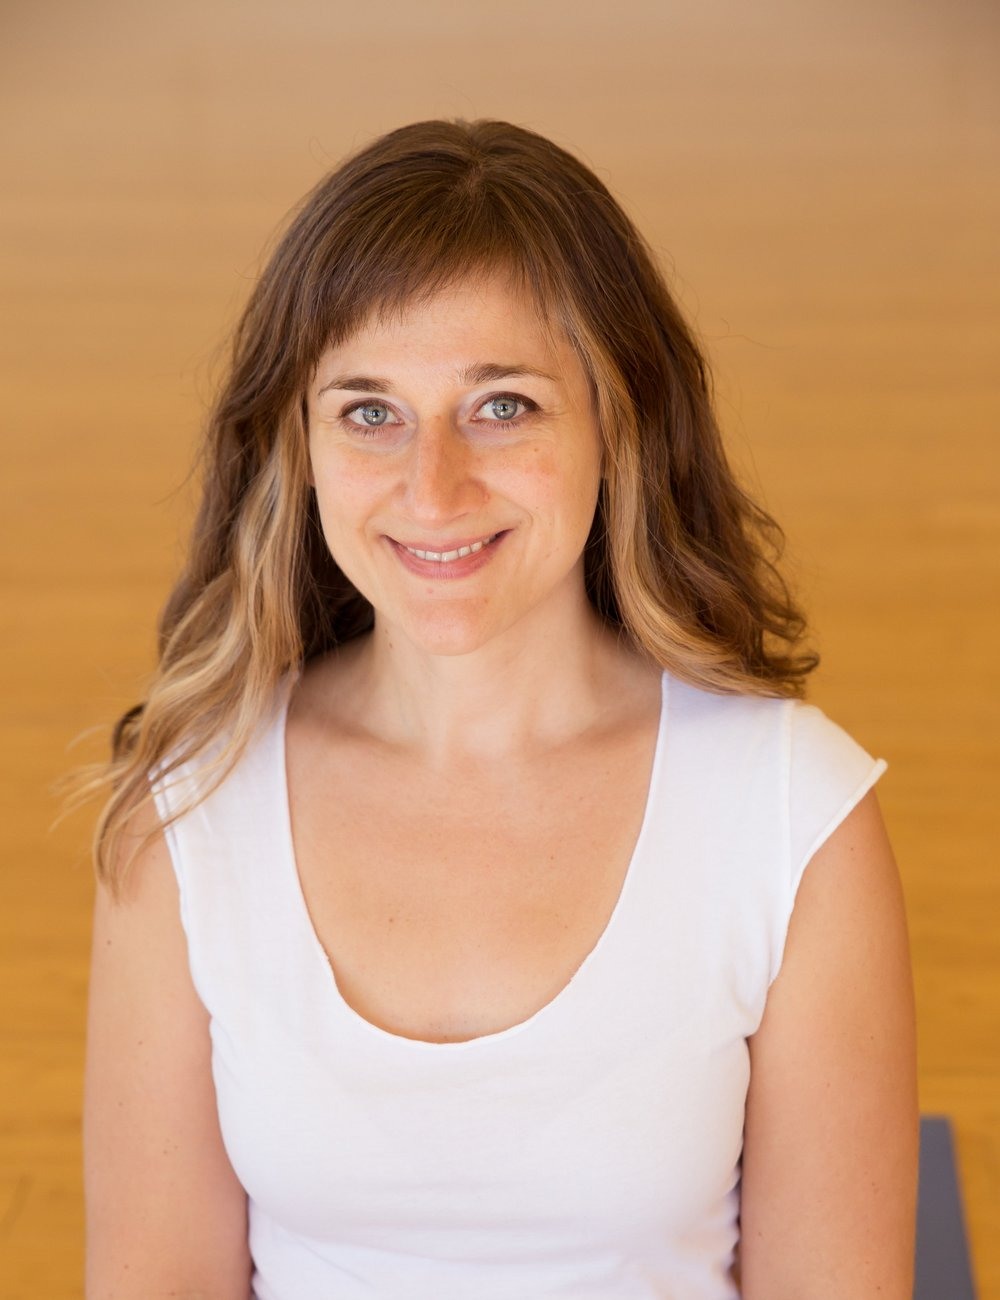 Lindsay Majer